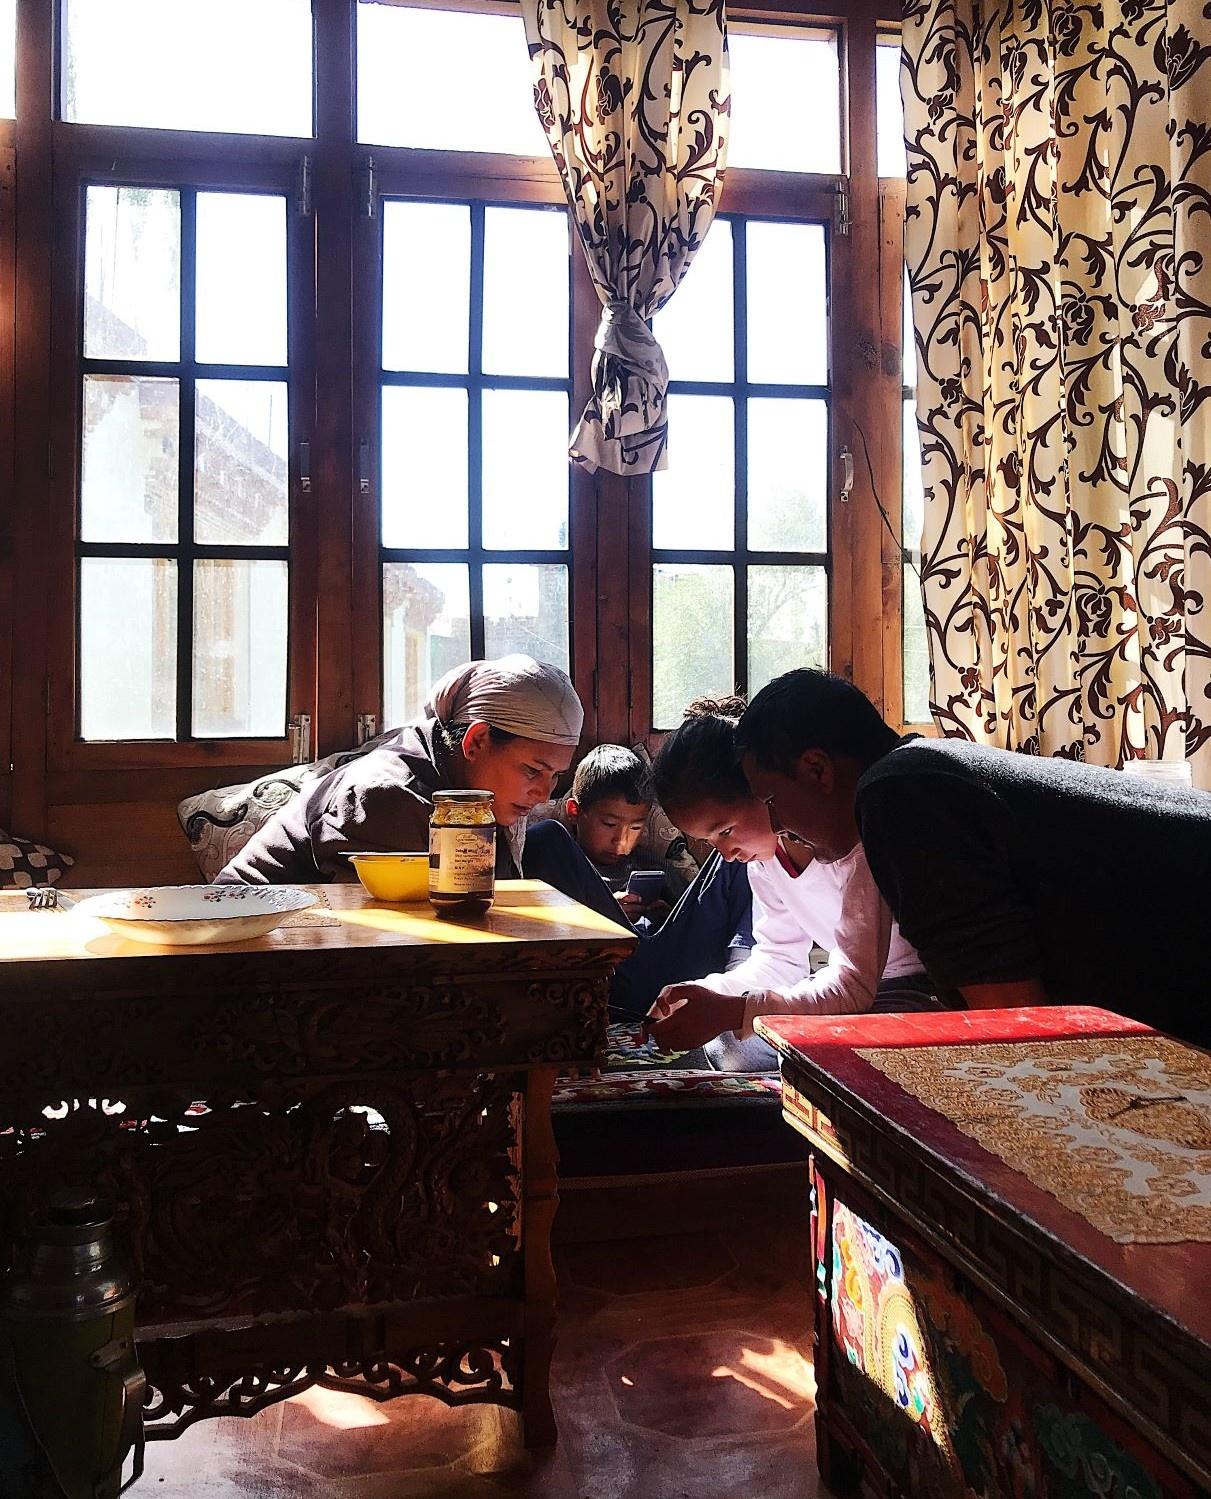 Duong den Ladakh - hanh trinh danh cho nhung doi chan khong biet moi hinh anh 31